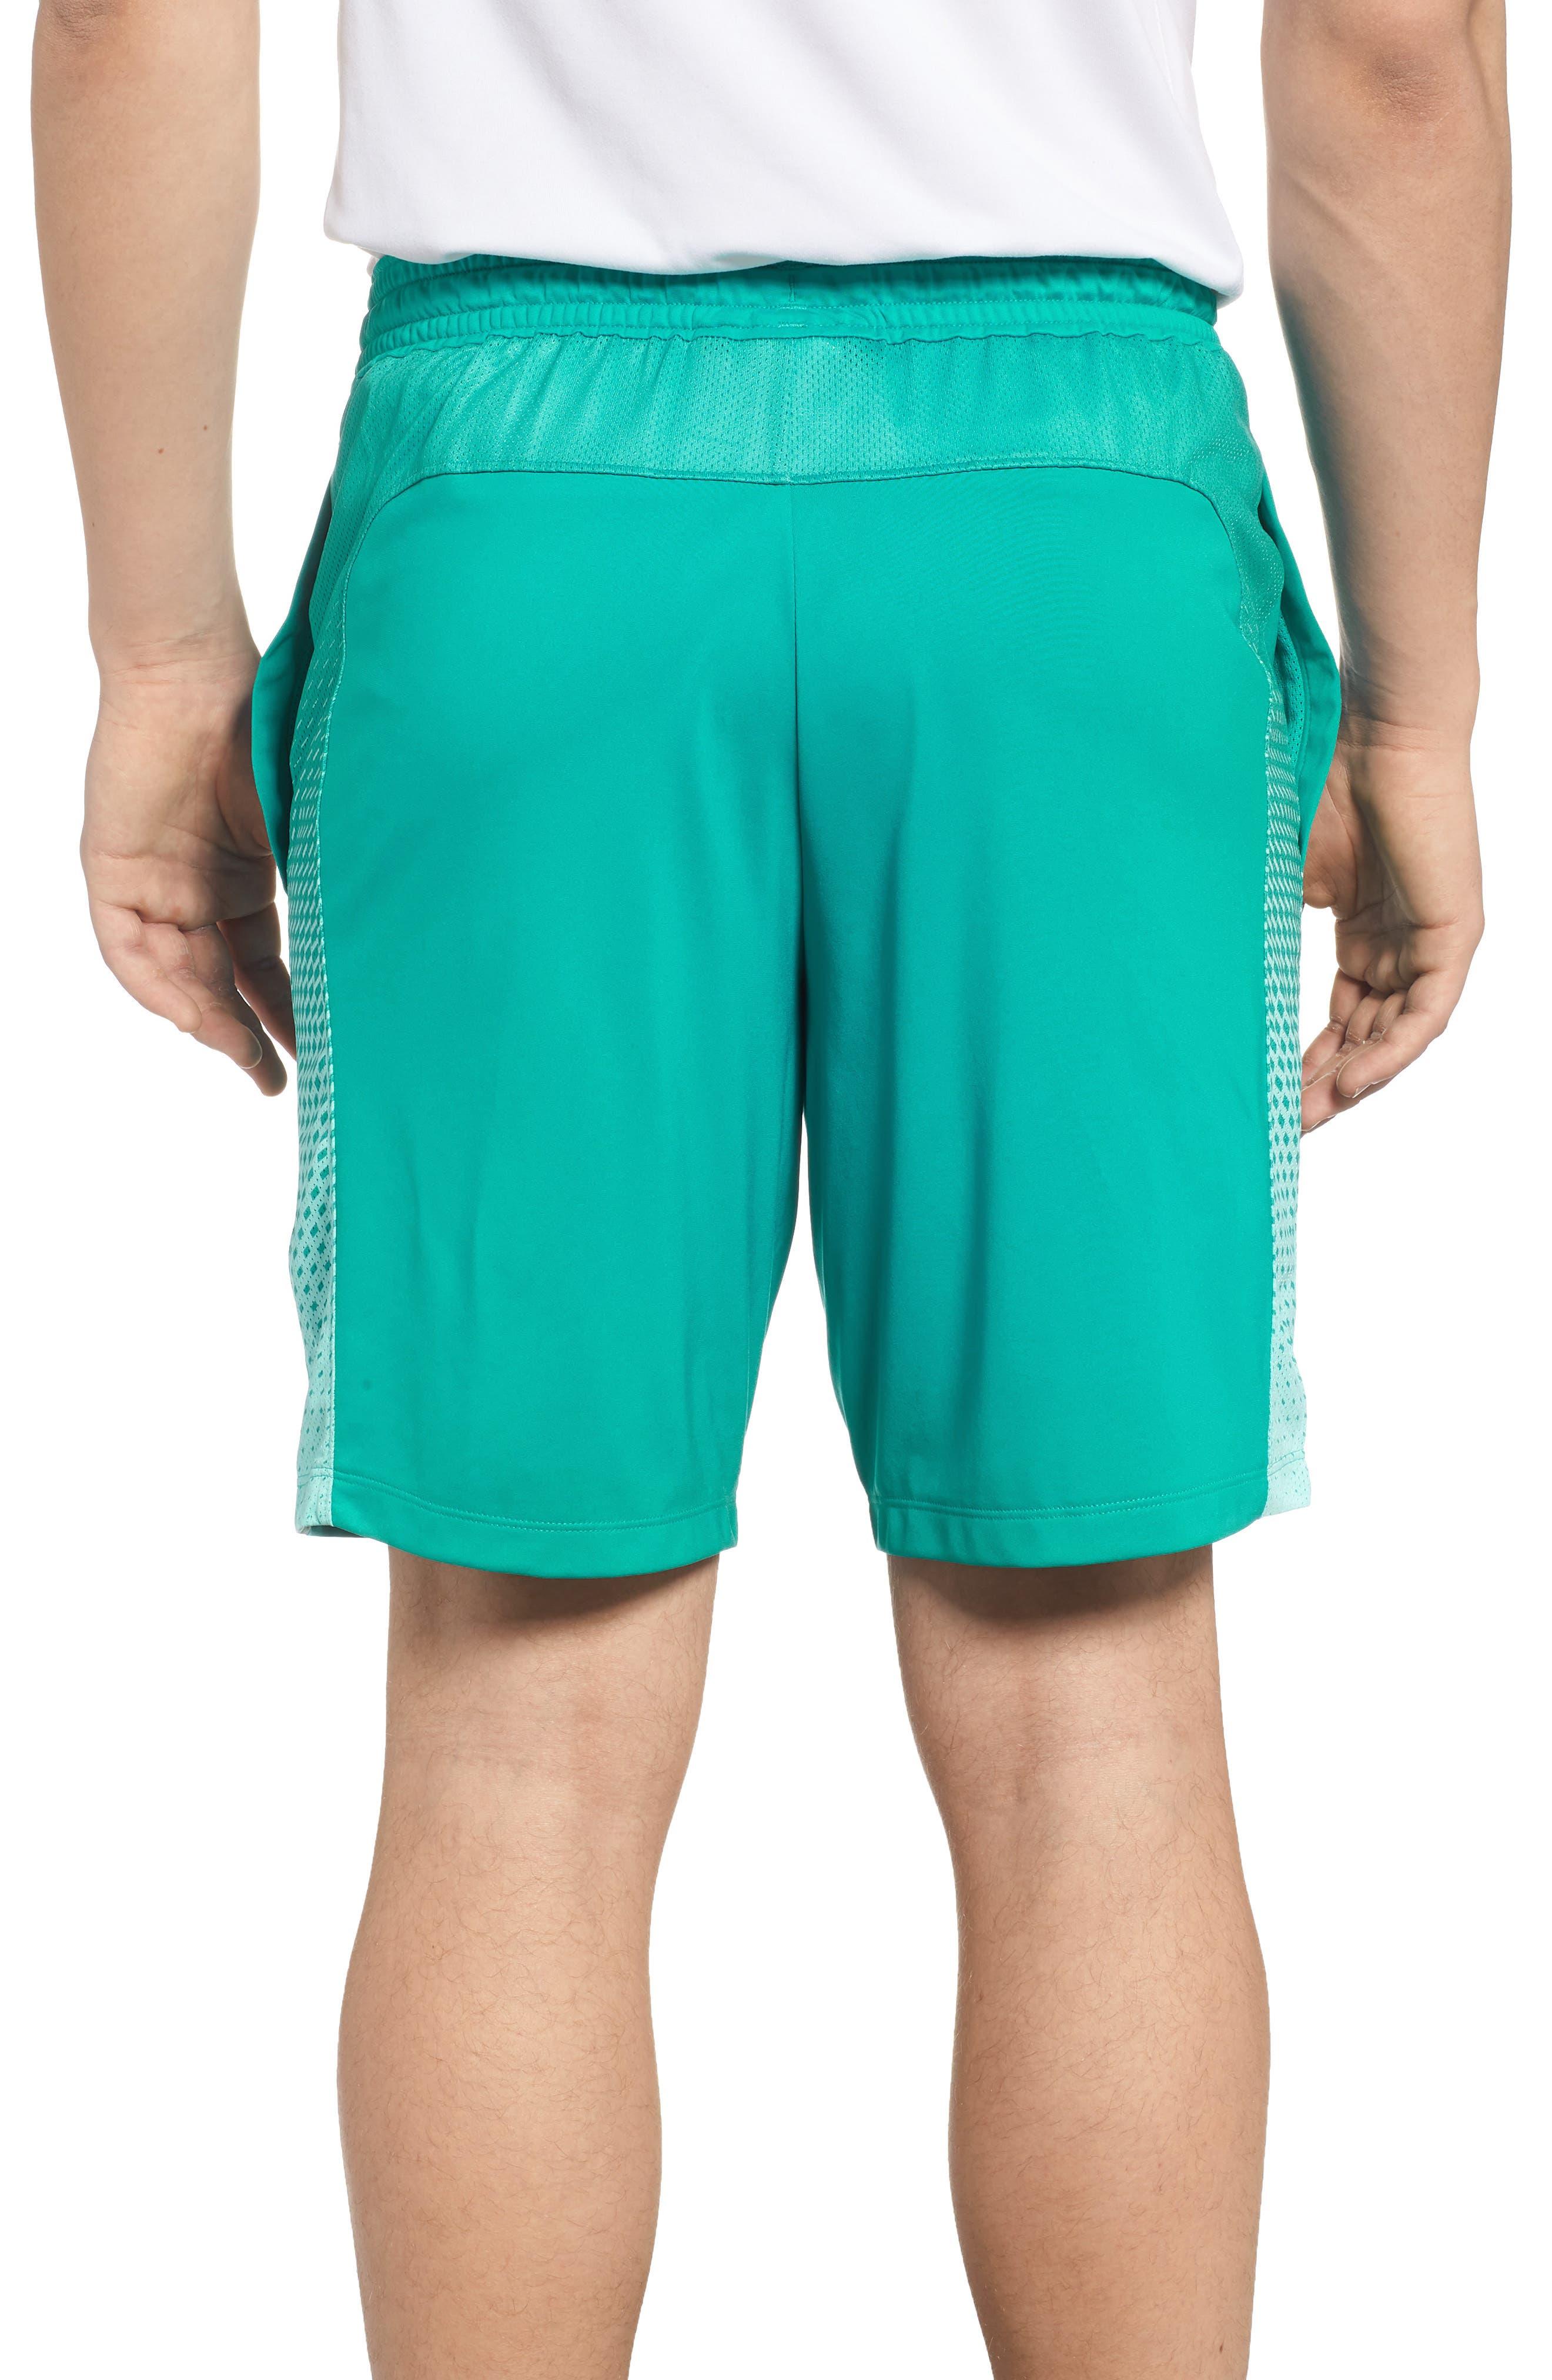 Mk1 Inset Fade Shorts,                             Alternate thumbnail 2, color,                             SWALLOWTAIL / TIDE / GREY